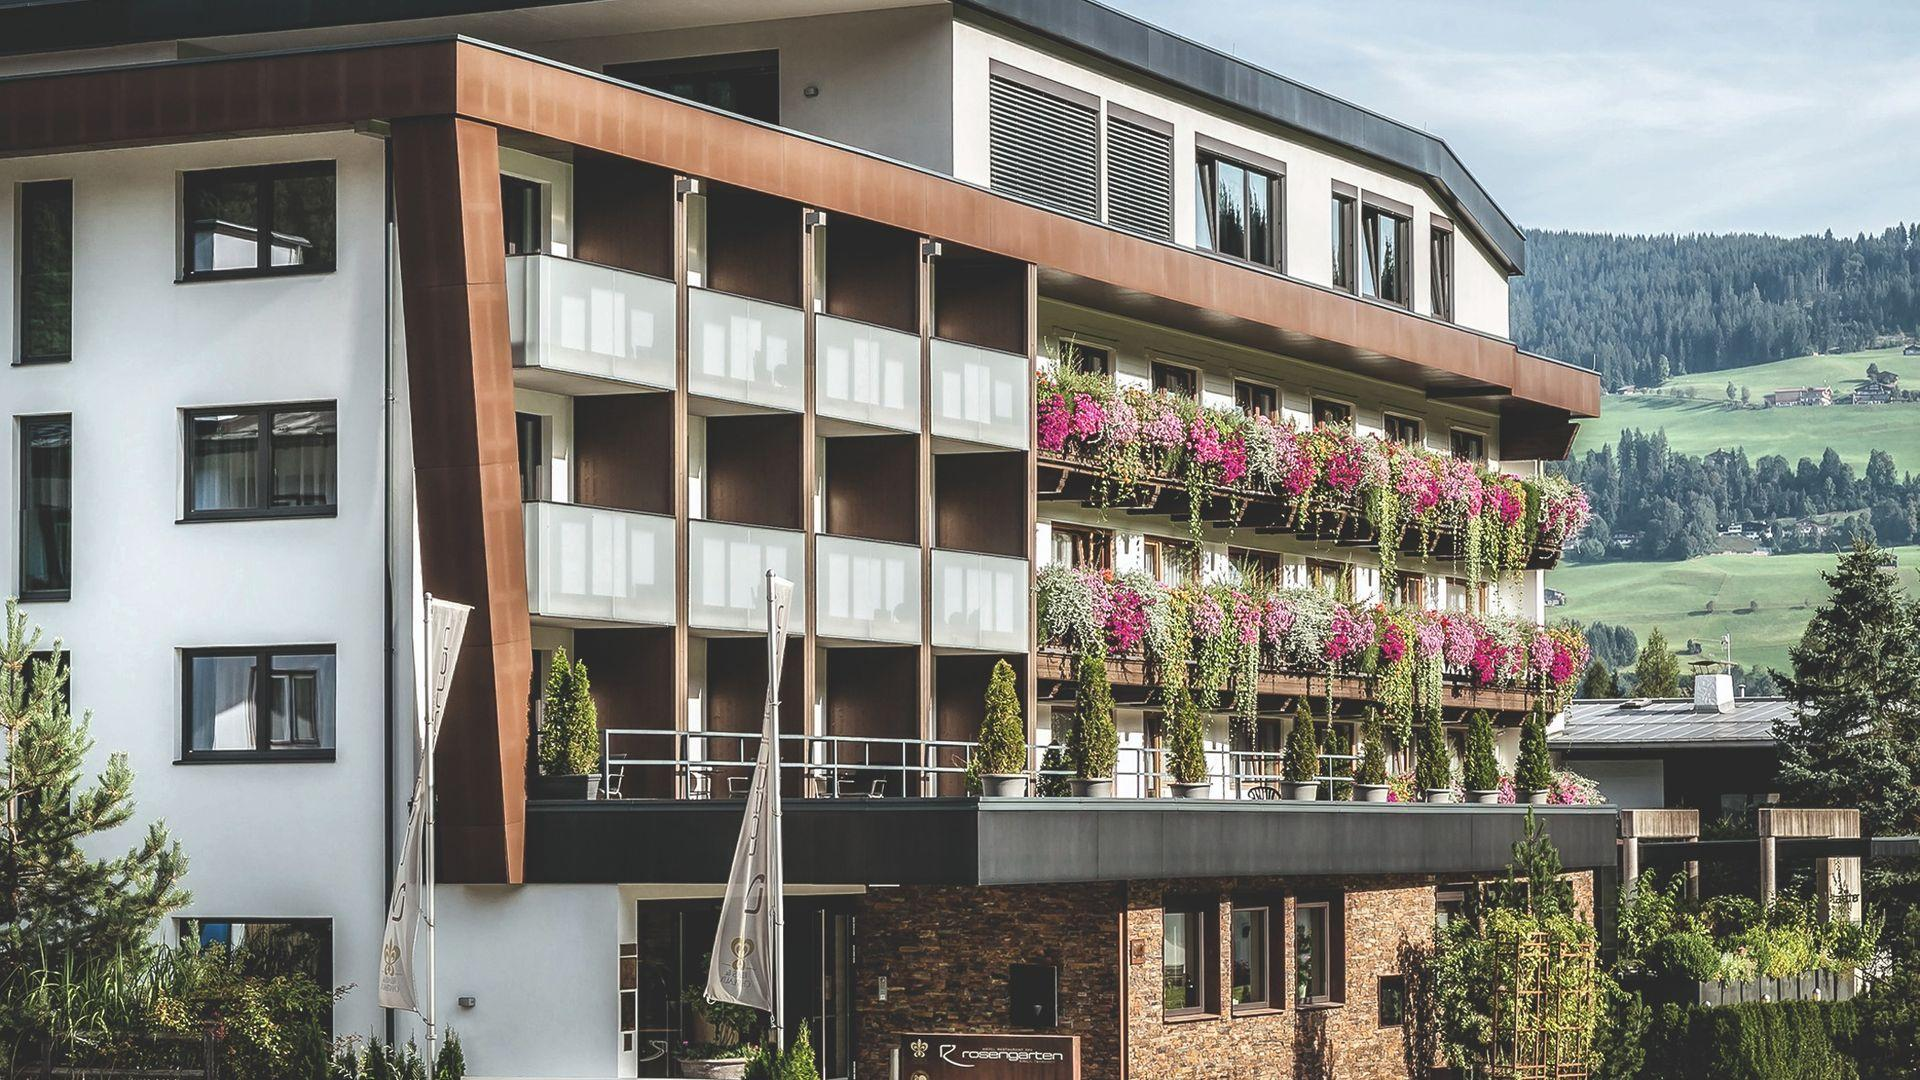 5* Relais & Chateaux Rosengarten